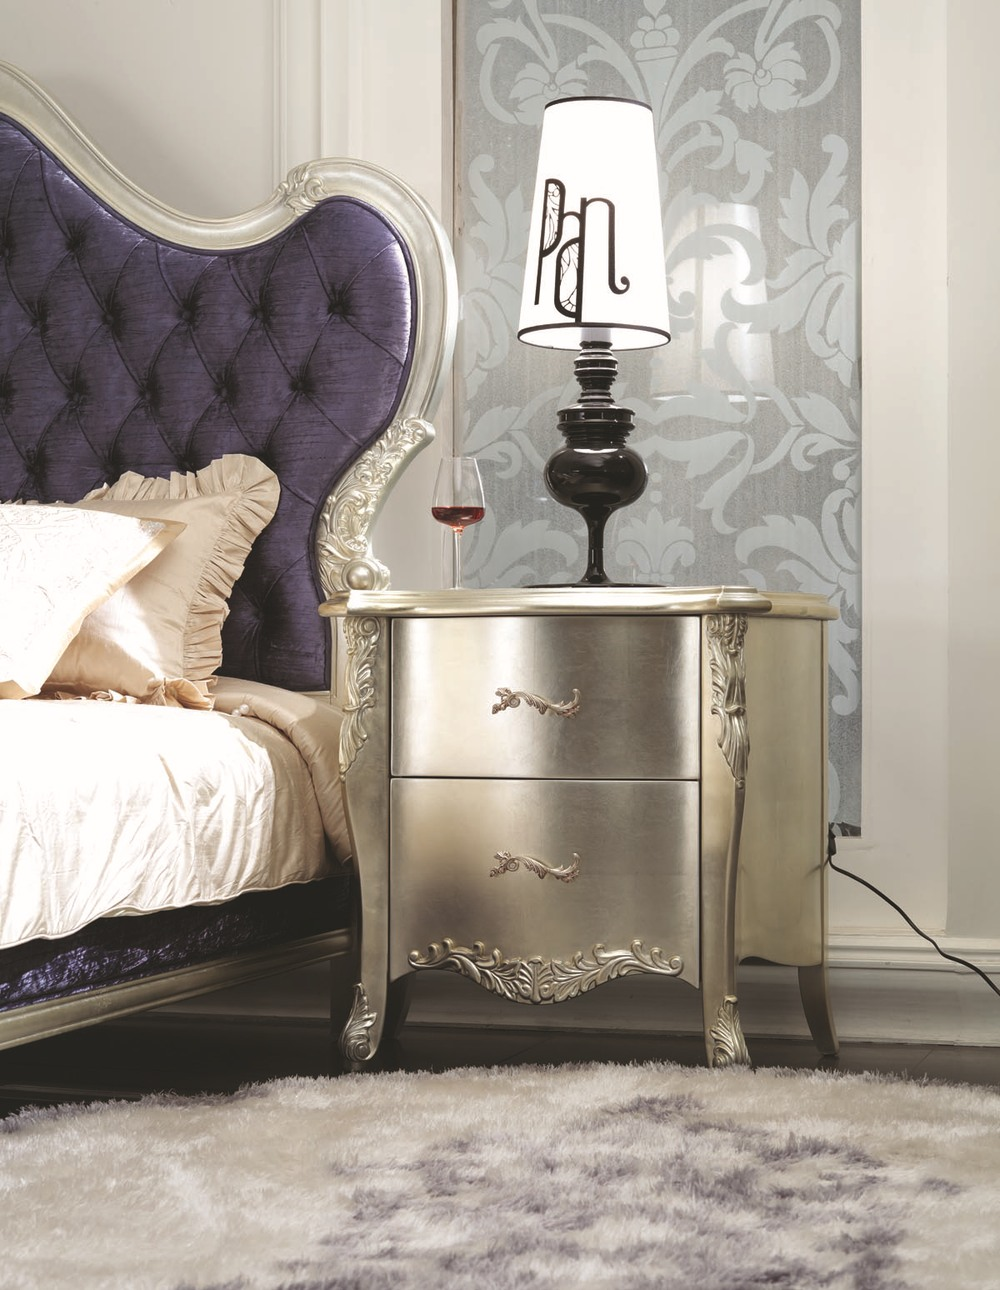 chinese bedroom furniture. Danxueya 2016 Wood Carving New Design Full Bedroom Set Chinese Wooden Furniture T